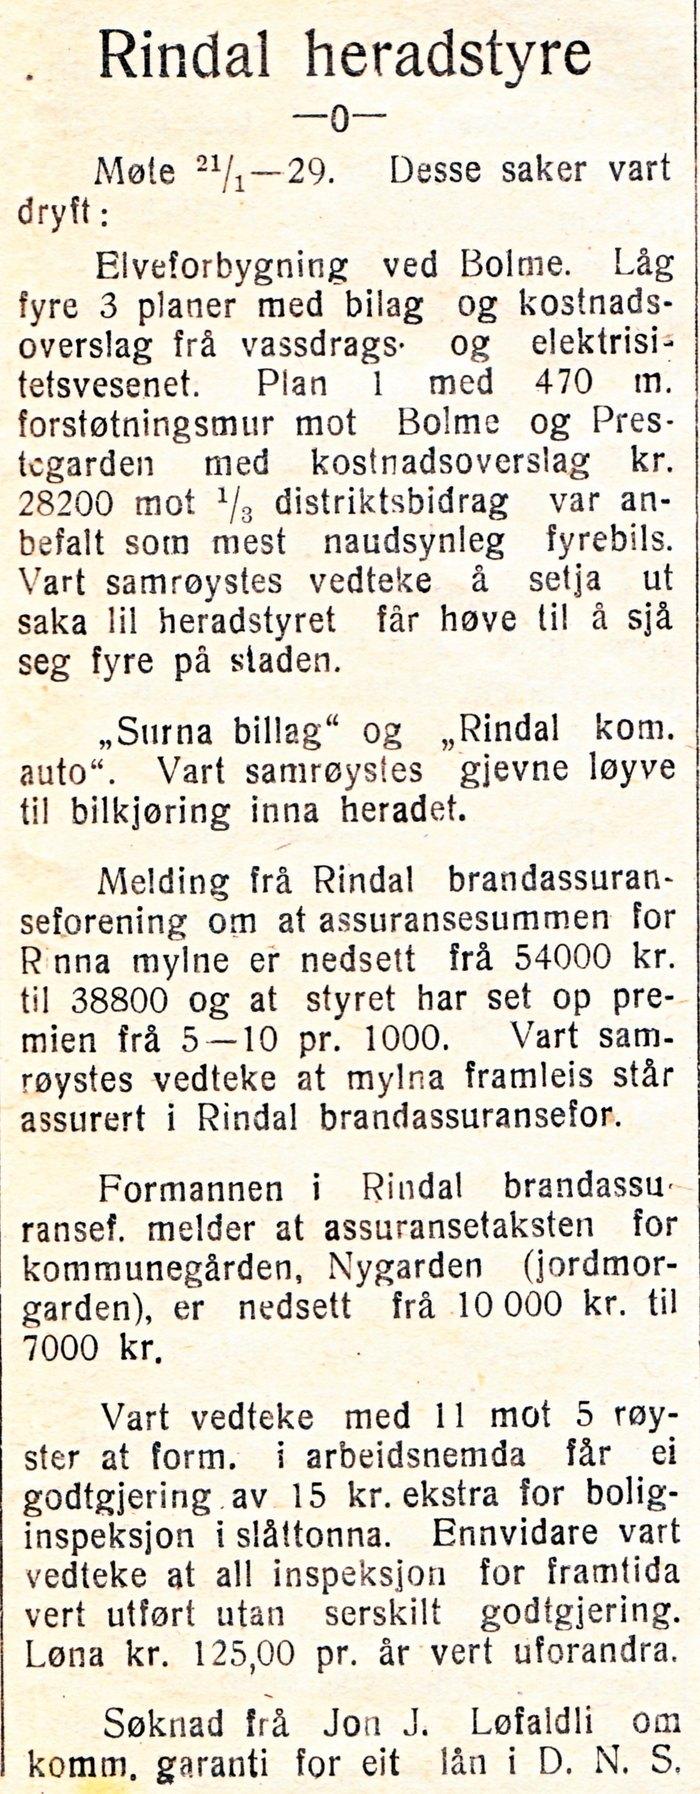 Rindal heradsstyre 1_700x1794.jpg